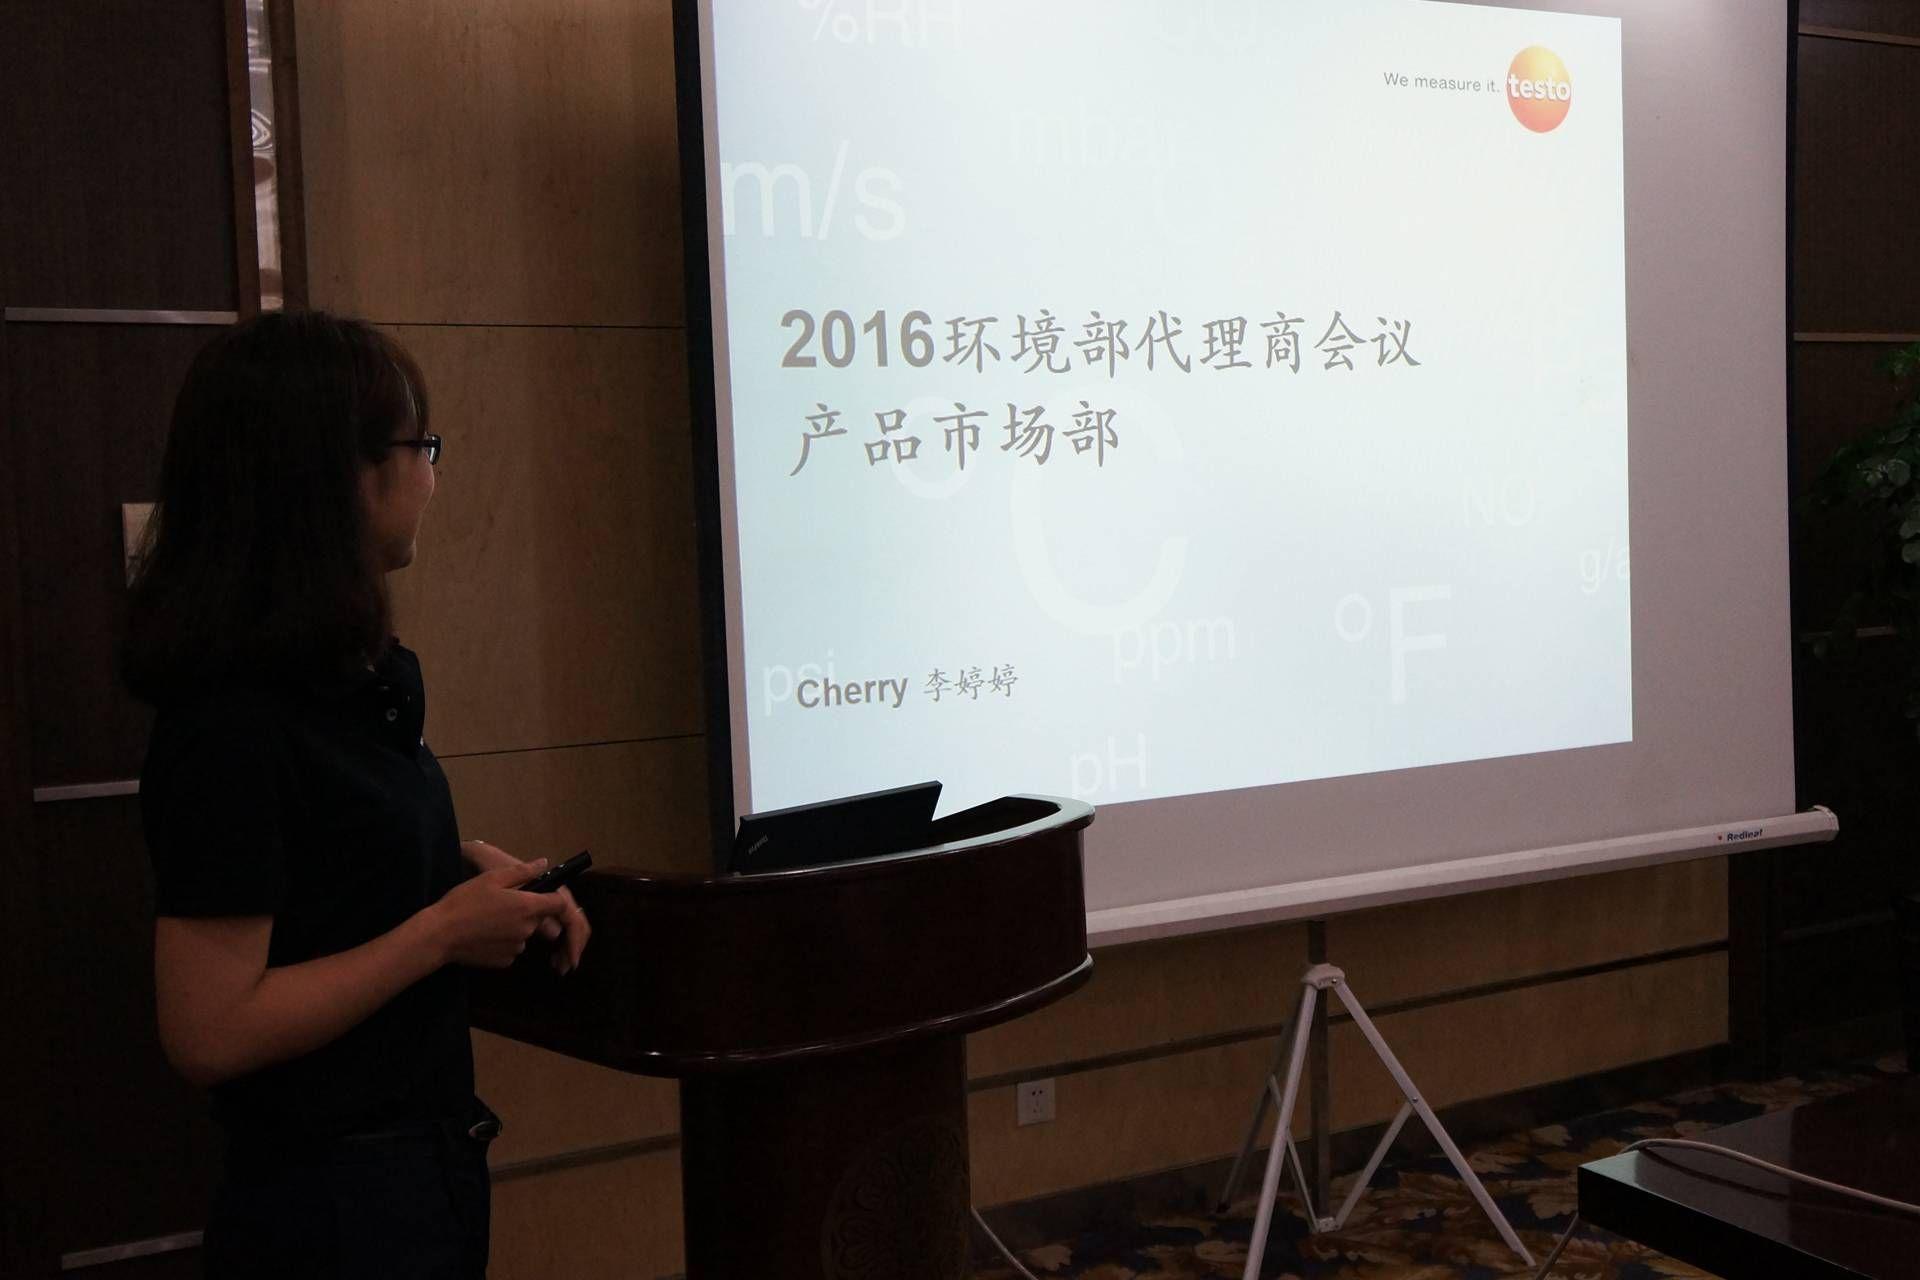 cn_company_news_dali_0401.jpg